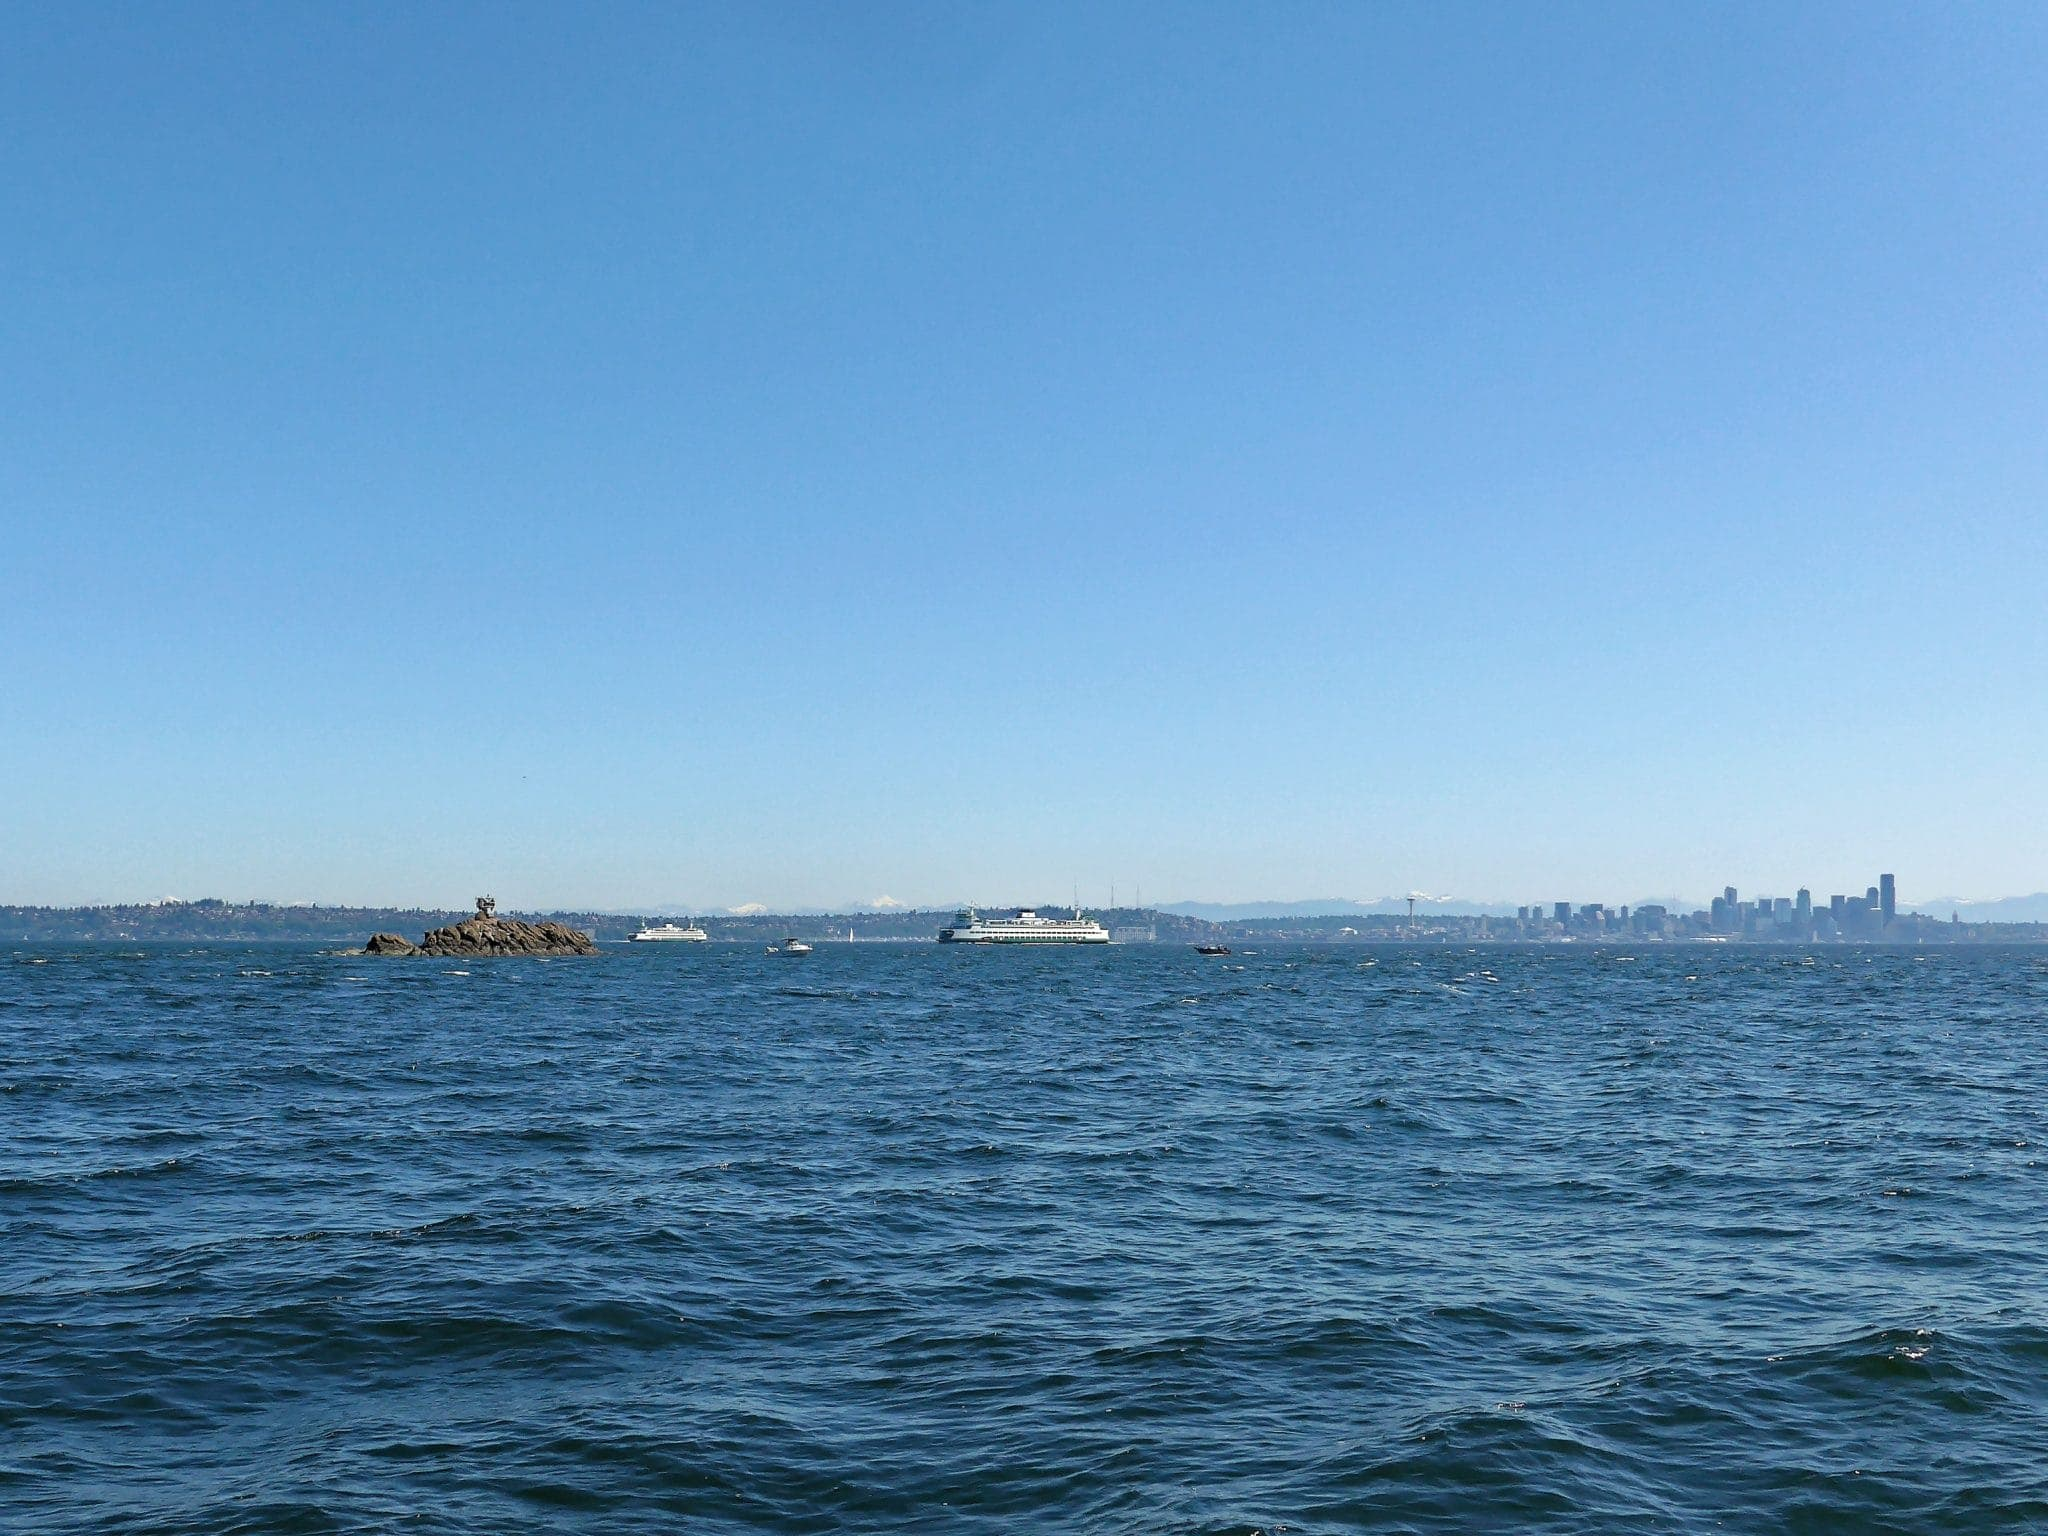 Blakeley Rocks with Bainbridge Ferries in background and Seattle